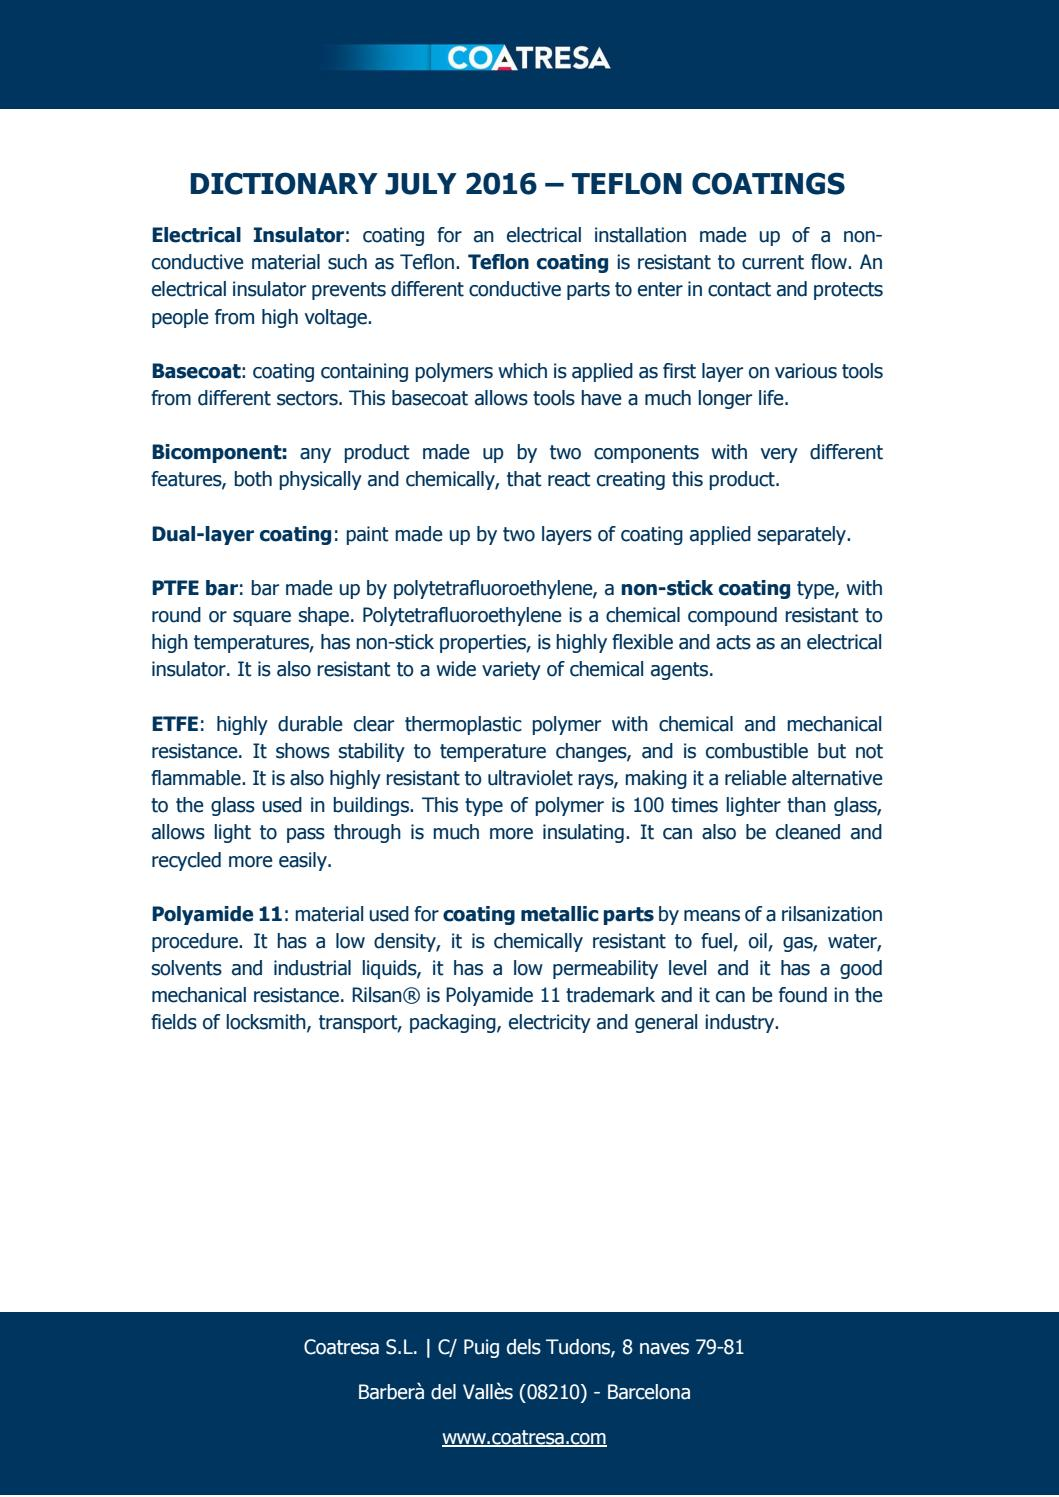 Dictionary july 2016 teflon coatings by Coatresa - Issuu